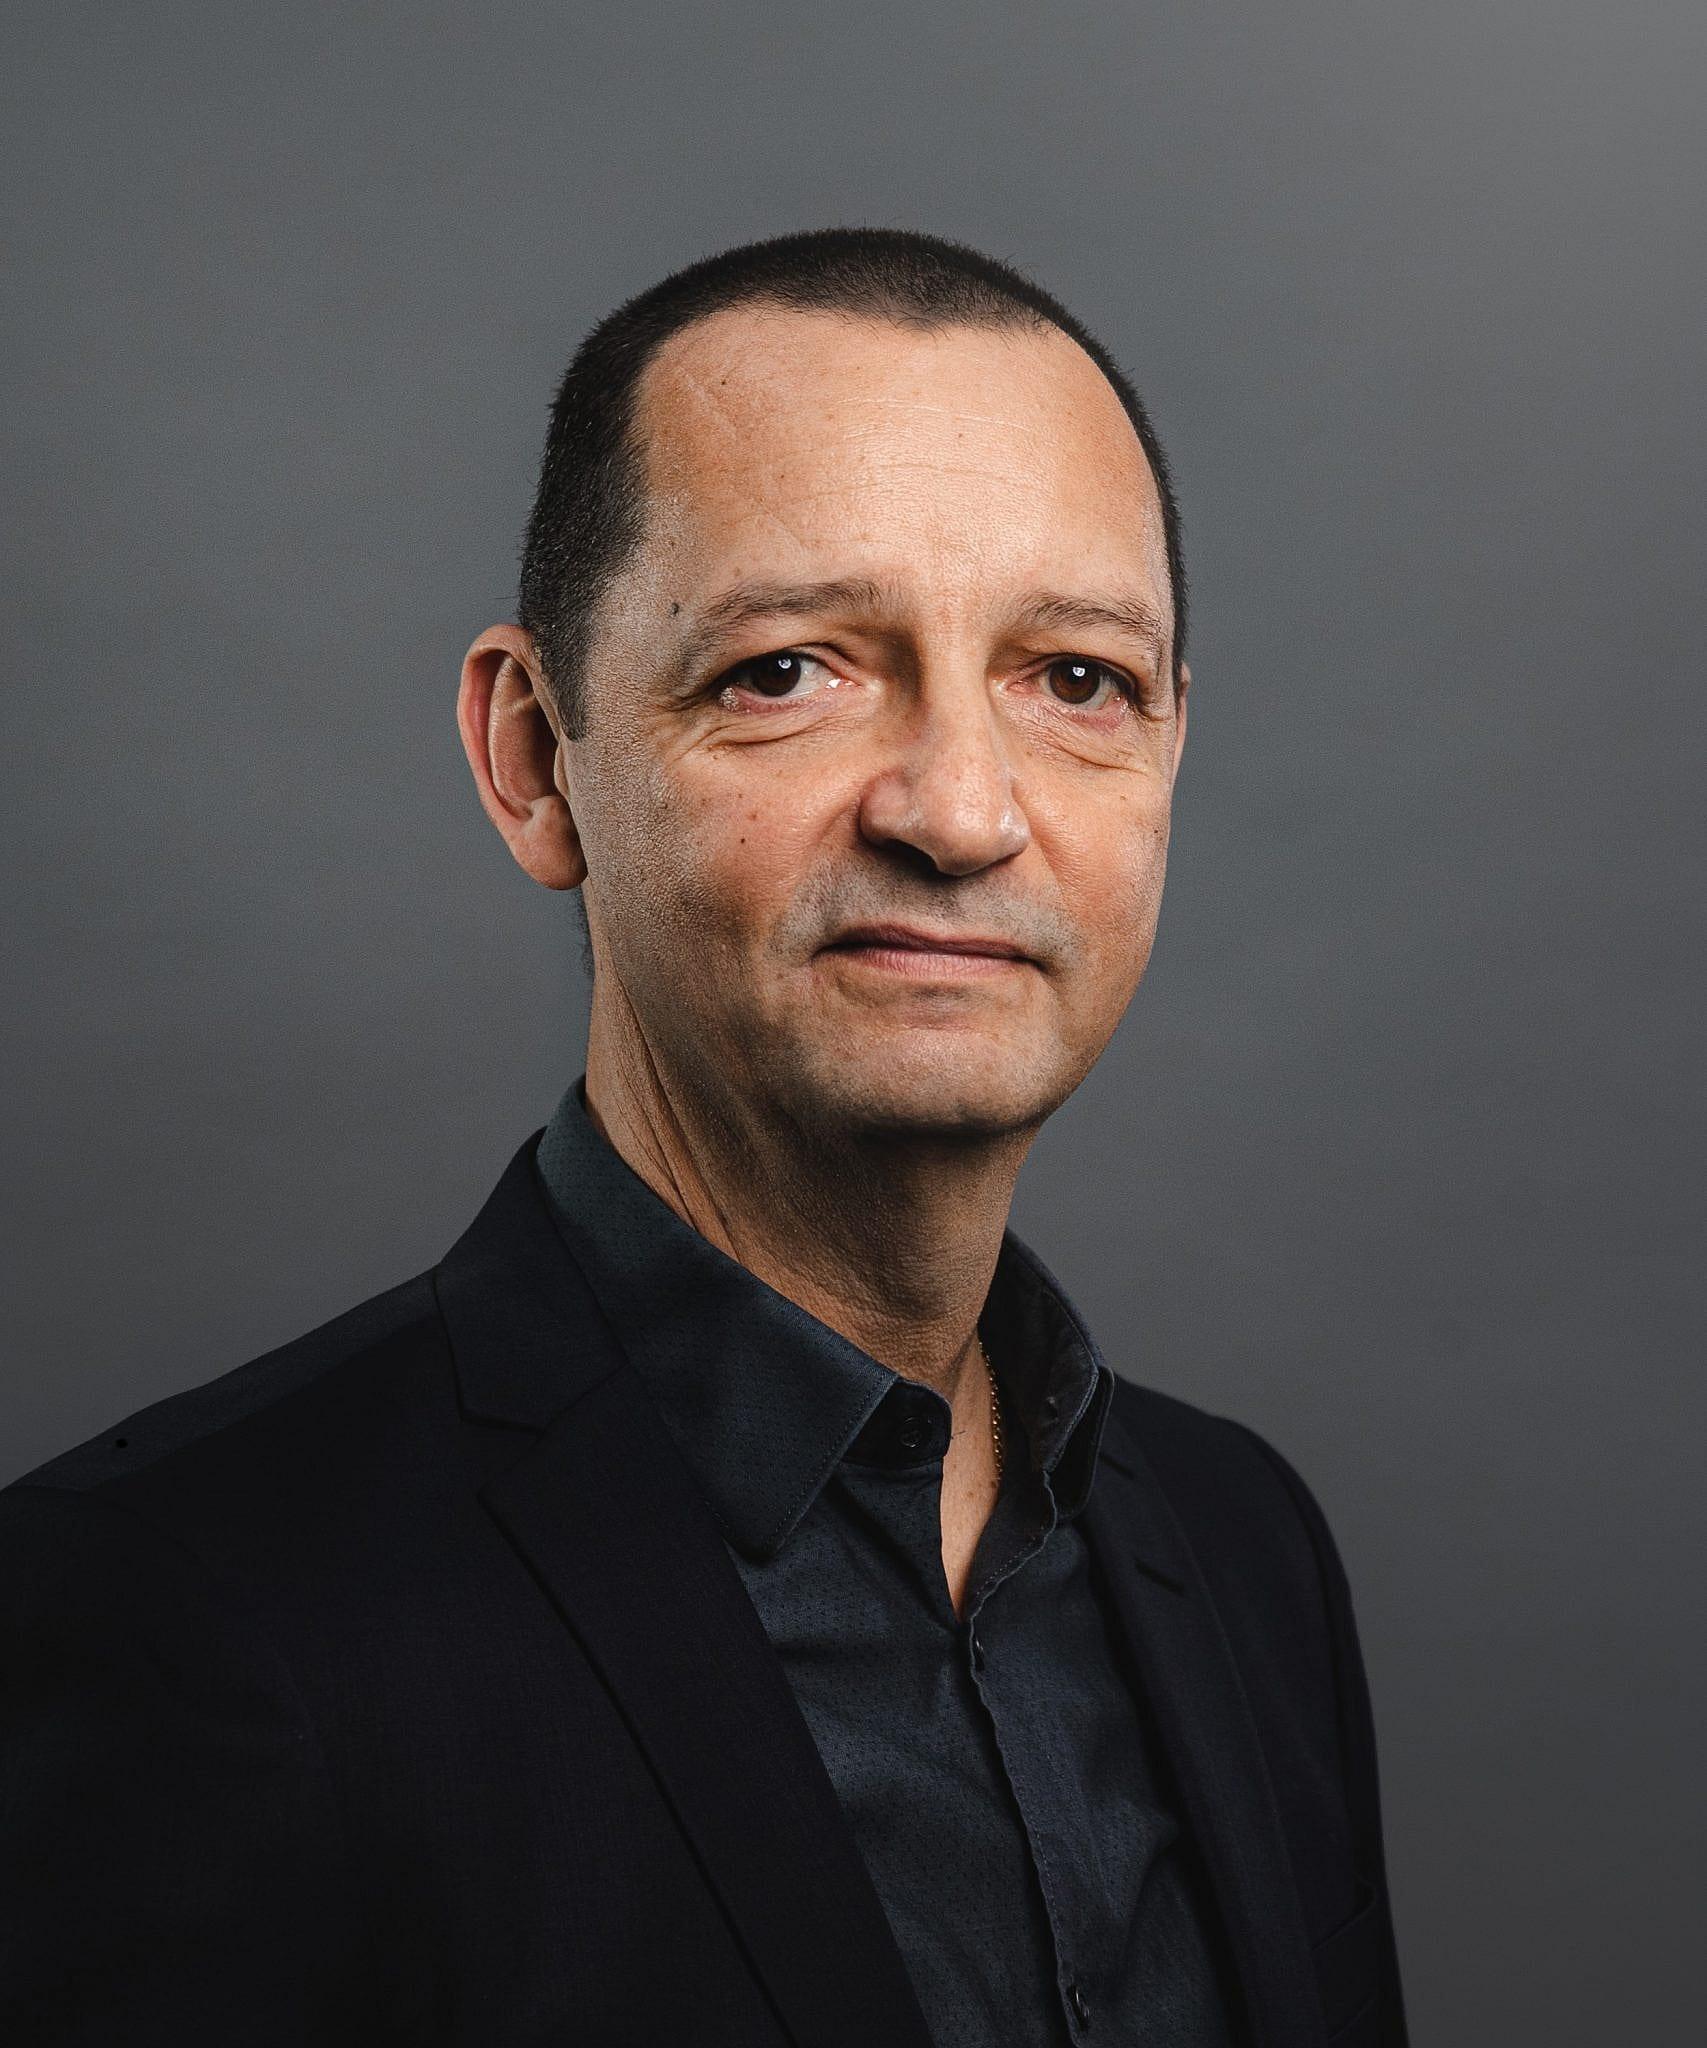 Hassan Soussi